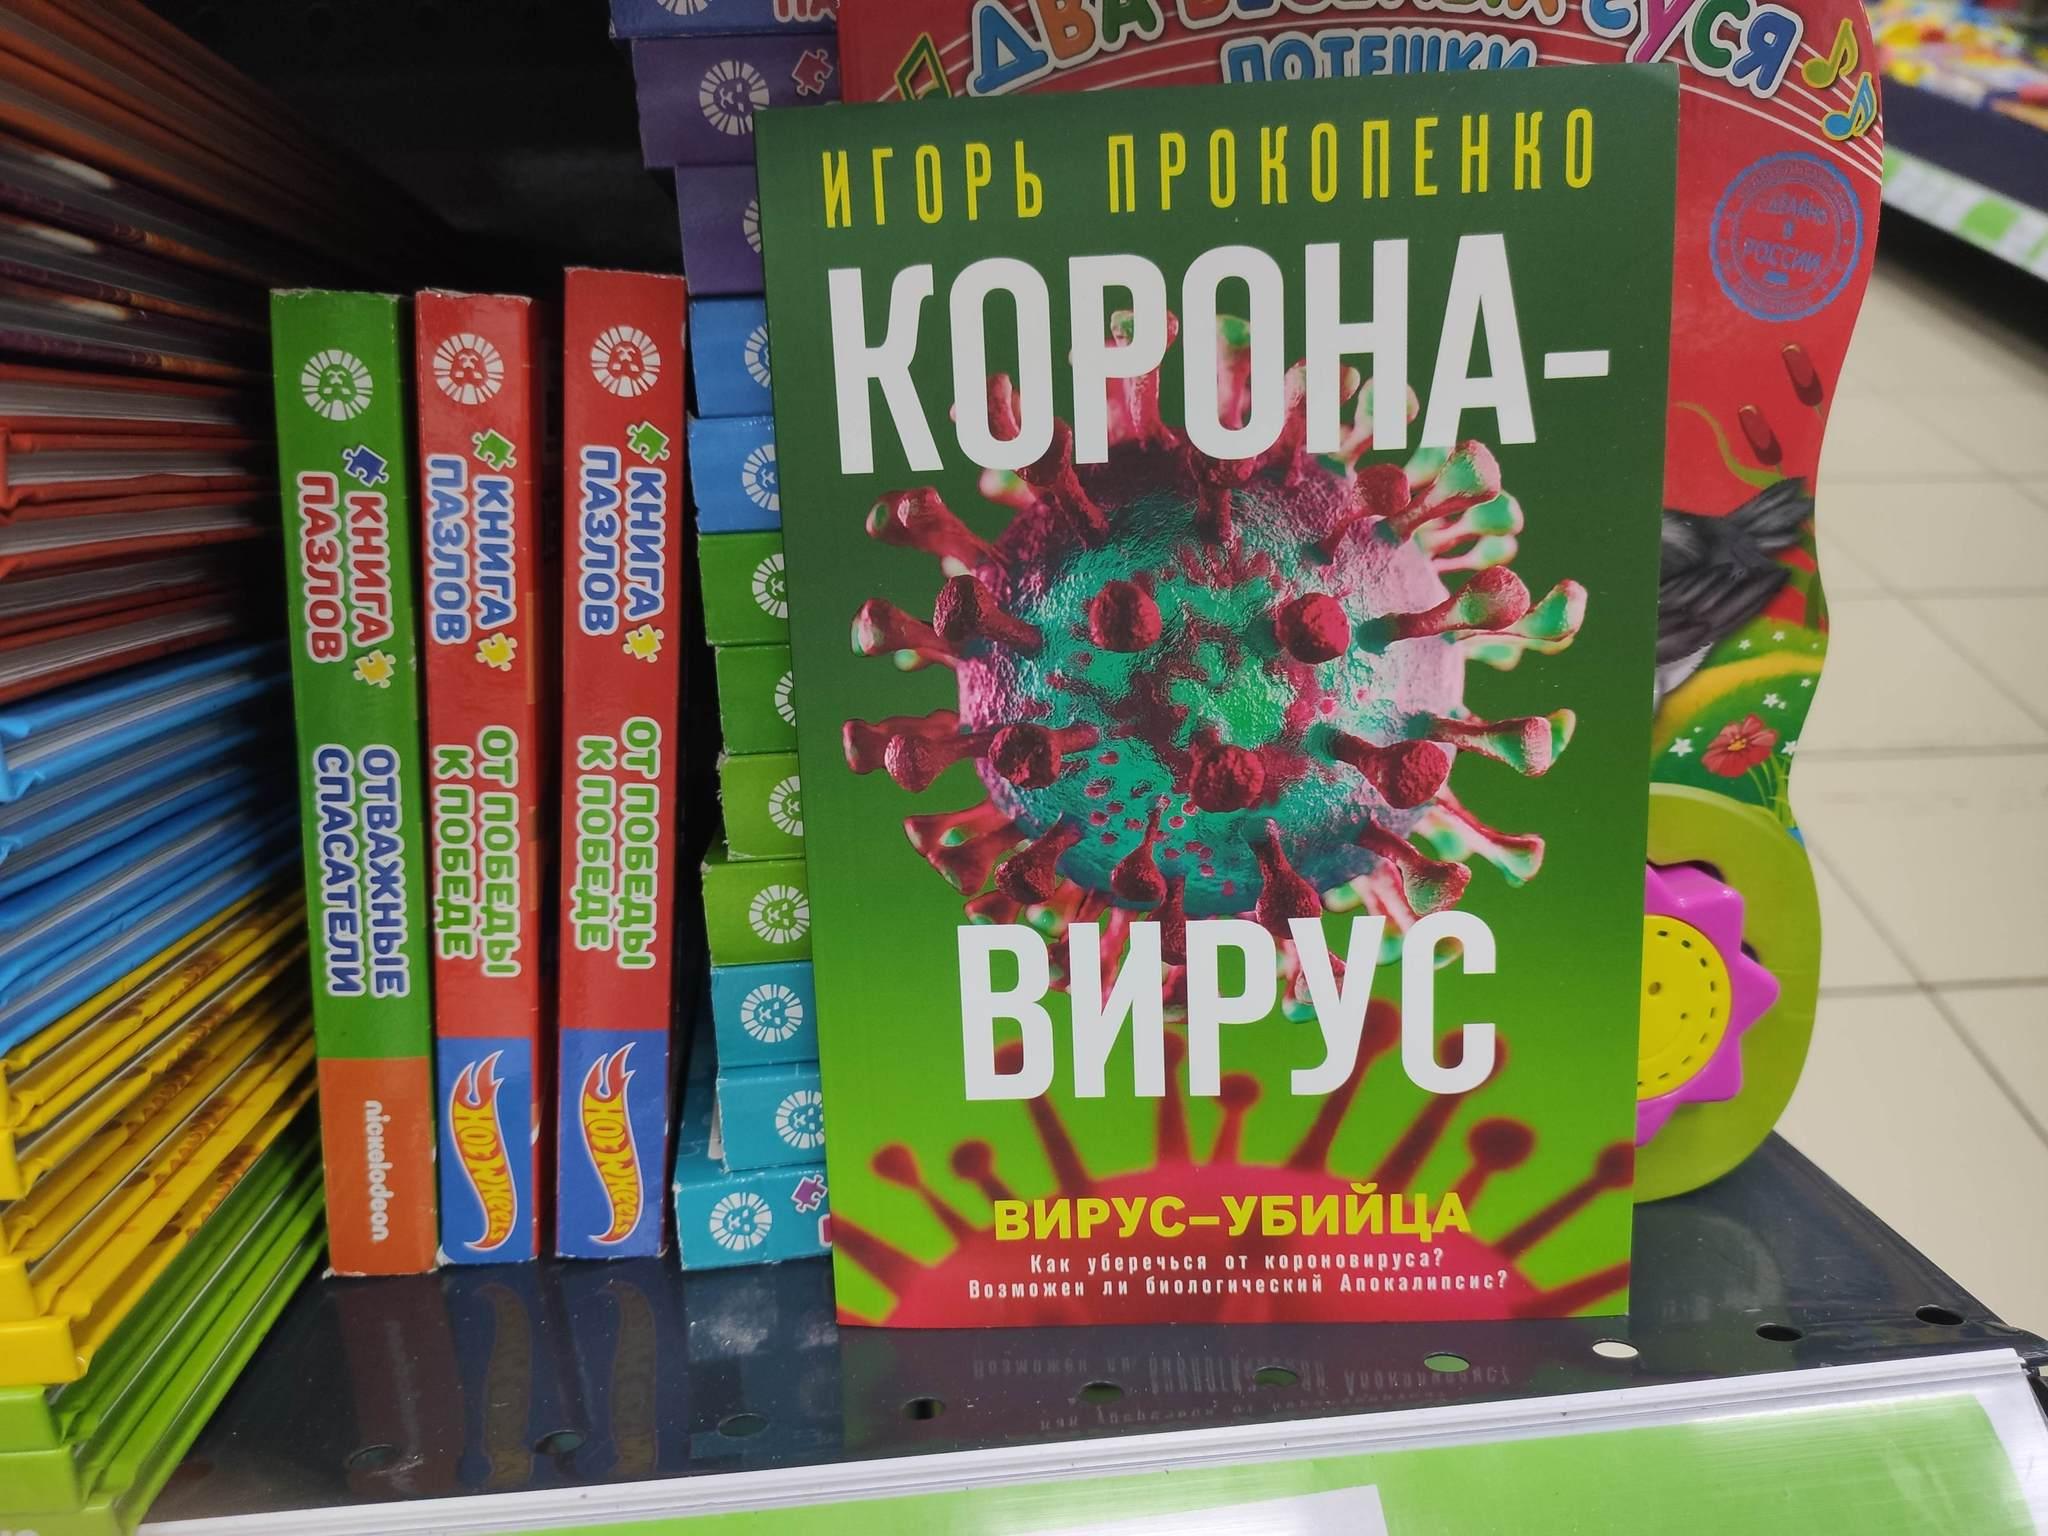 https://cs13.pikabu.ru/post_img/big/2020/05/07/7/1588850721144689721.jpg